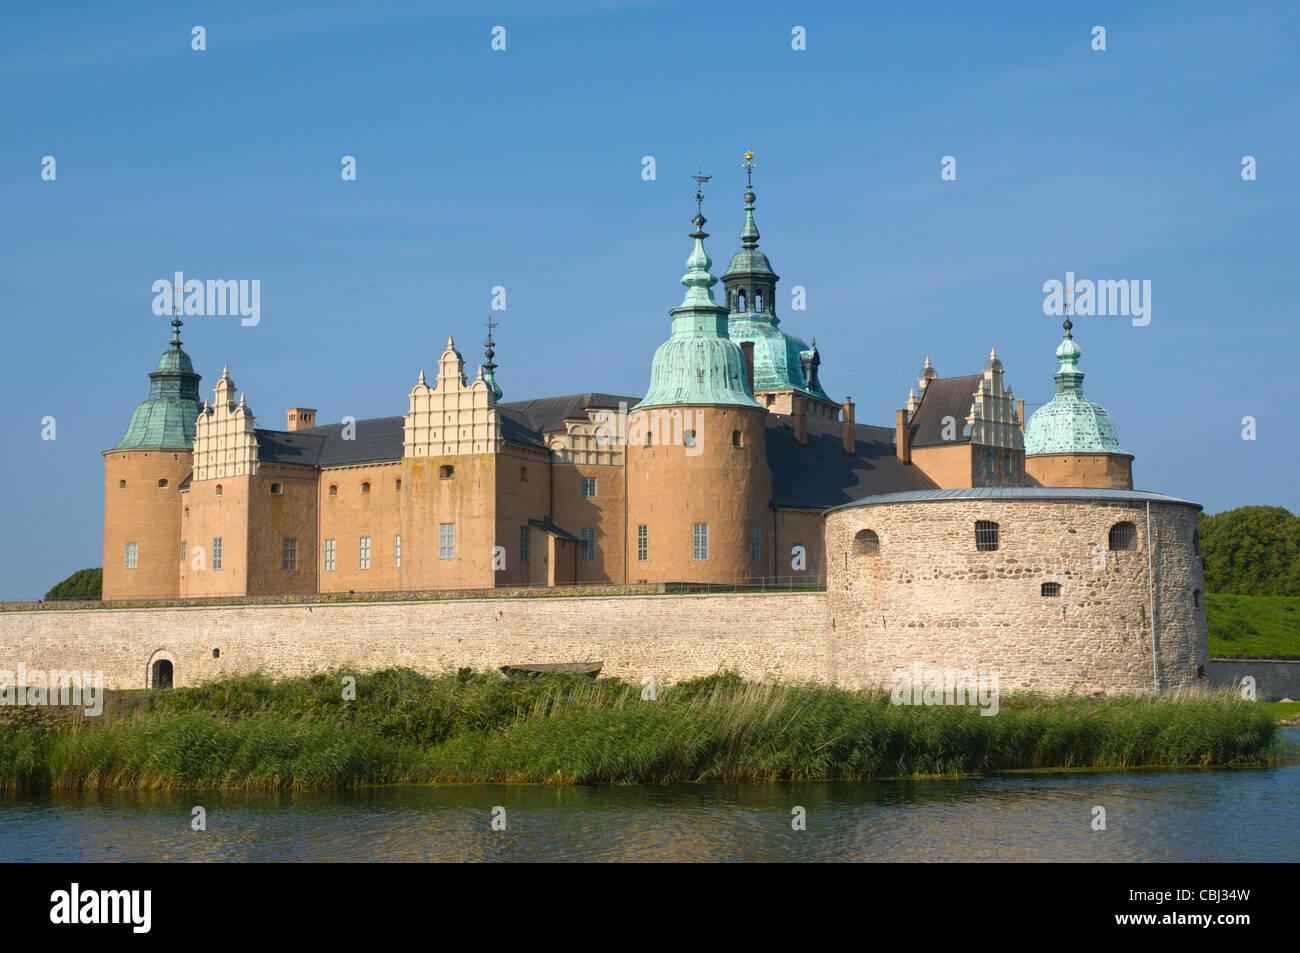 Kalmar slott the fortress in Kalmar city Småland southern Sweden Europe - Stock Image